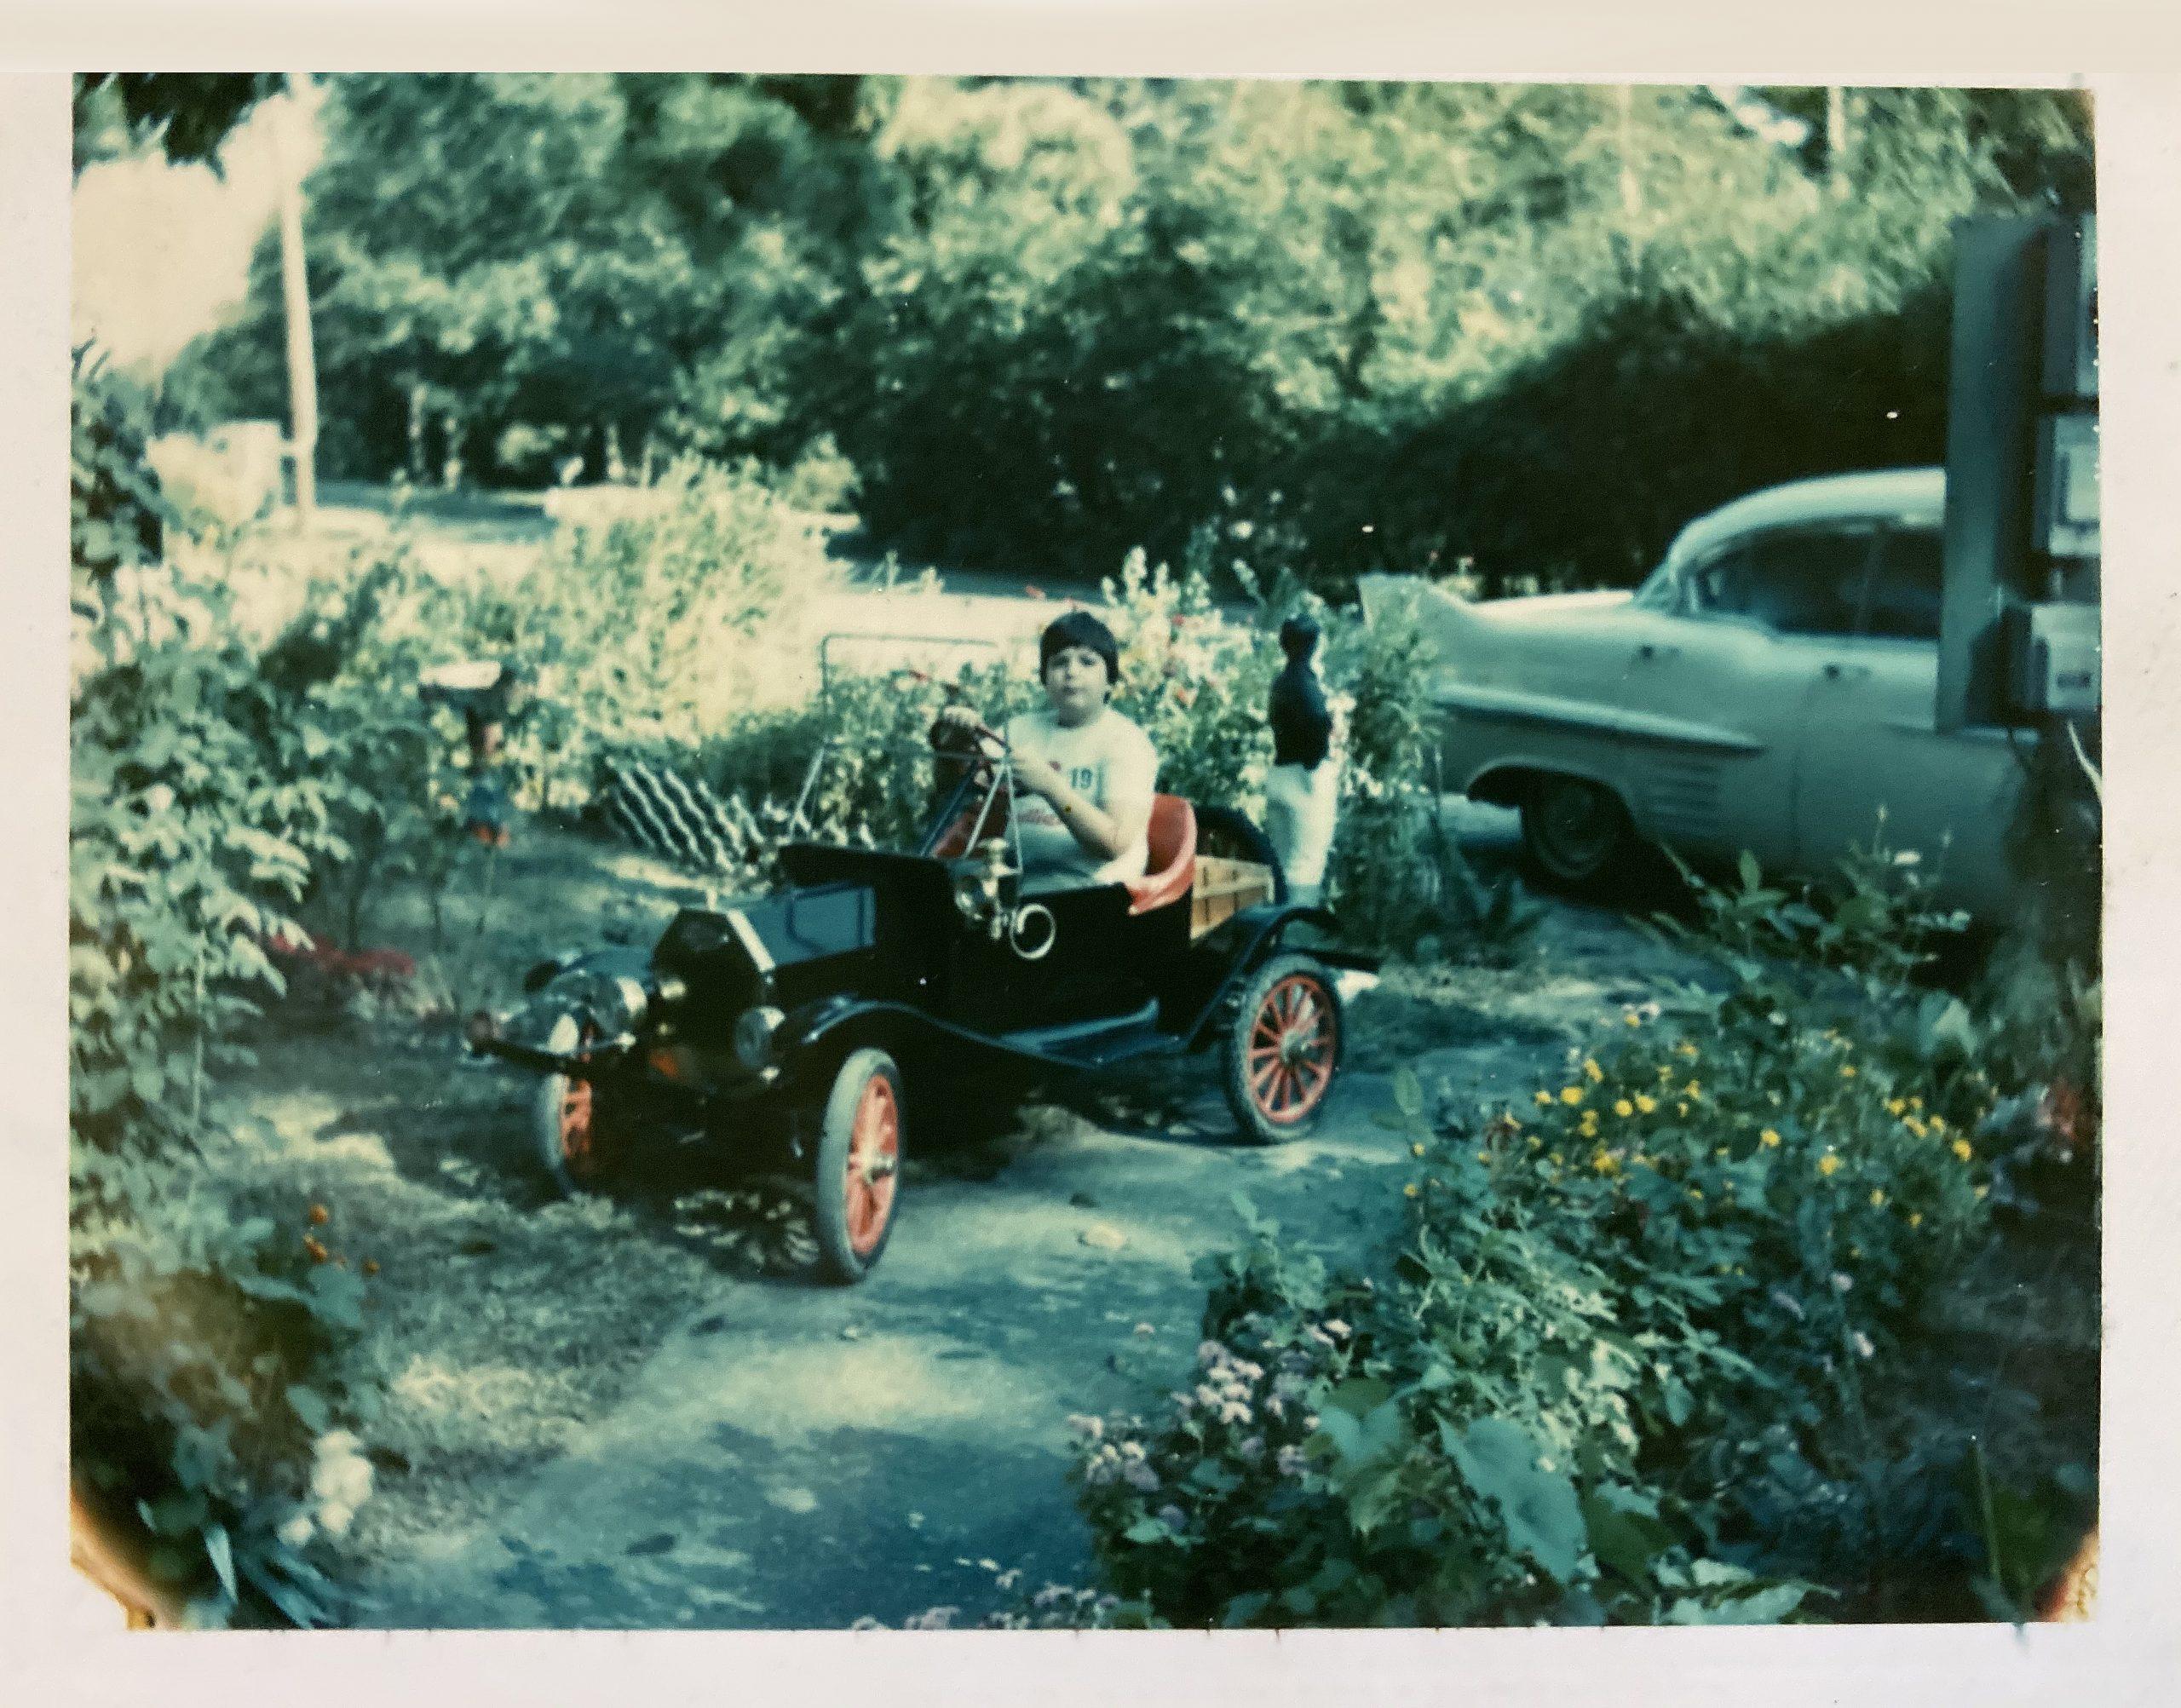 Model T Ford Midget Car